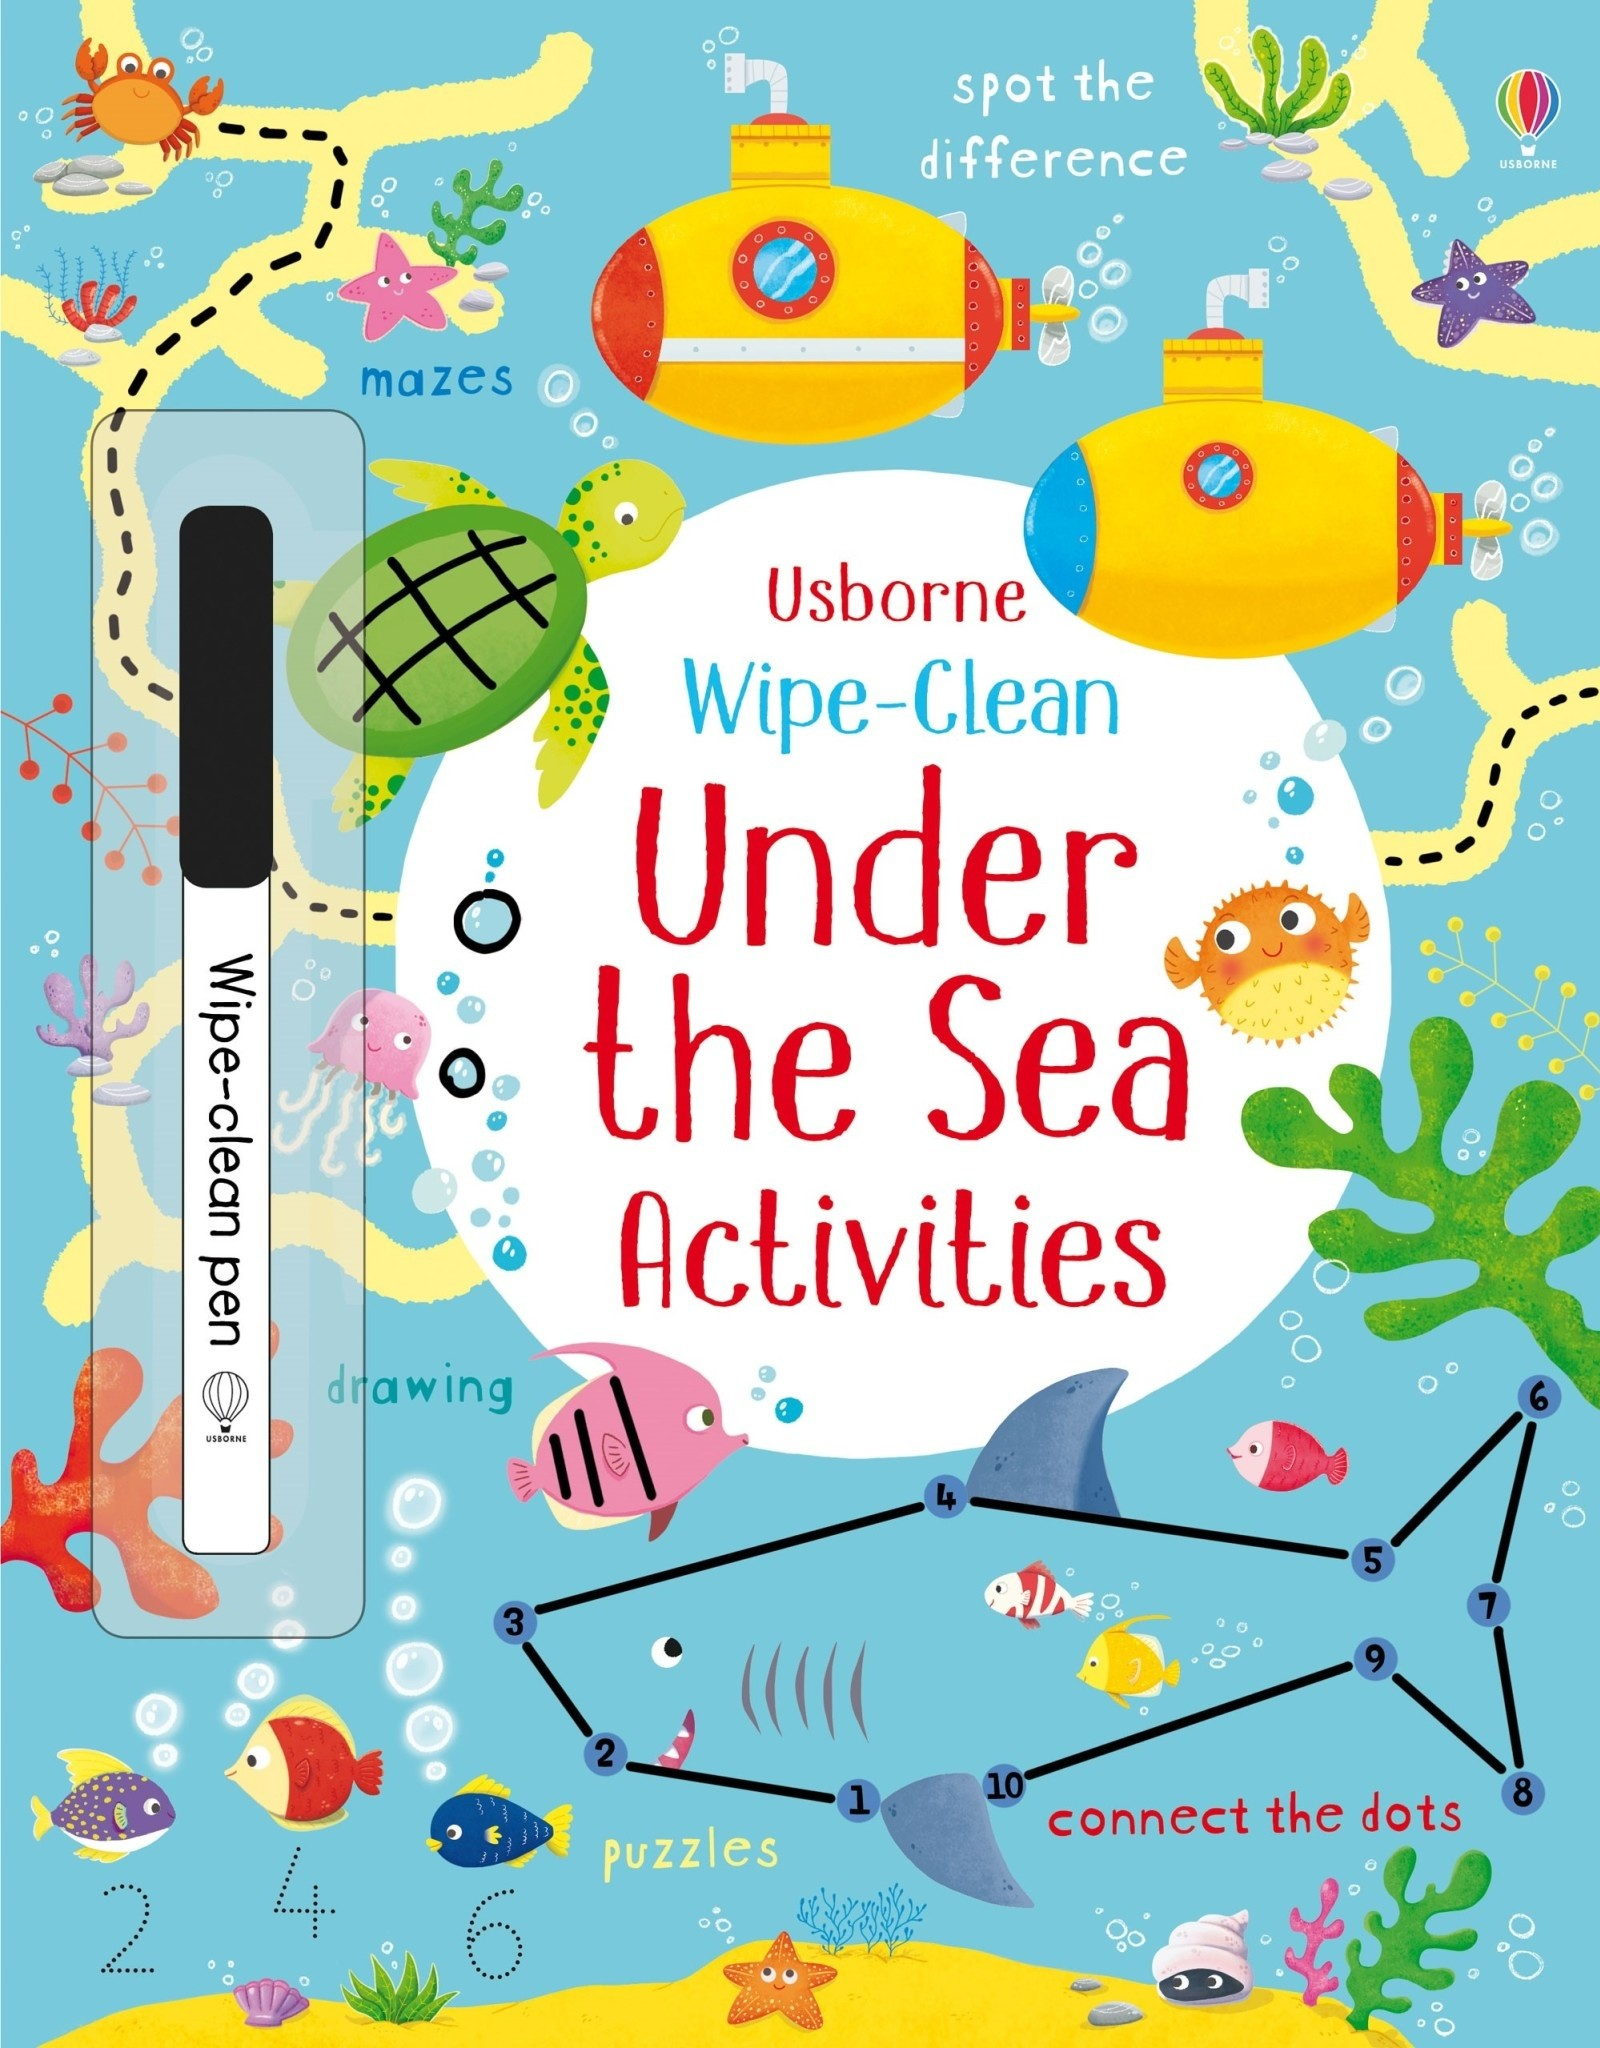 Usborne Wipe Clean Under the Sea Activities